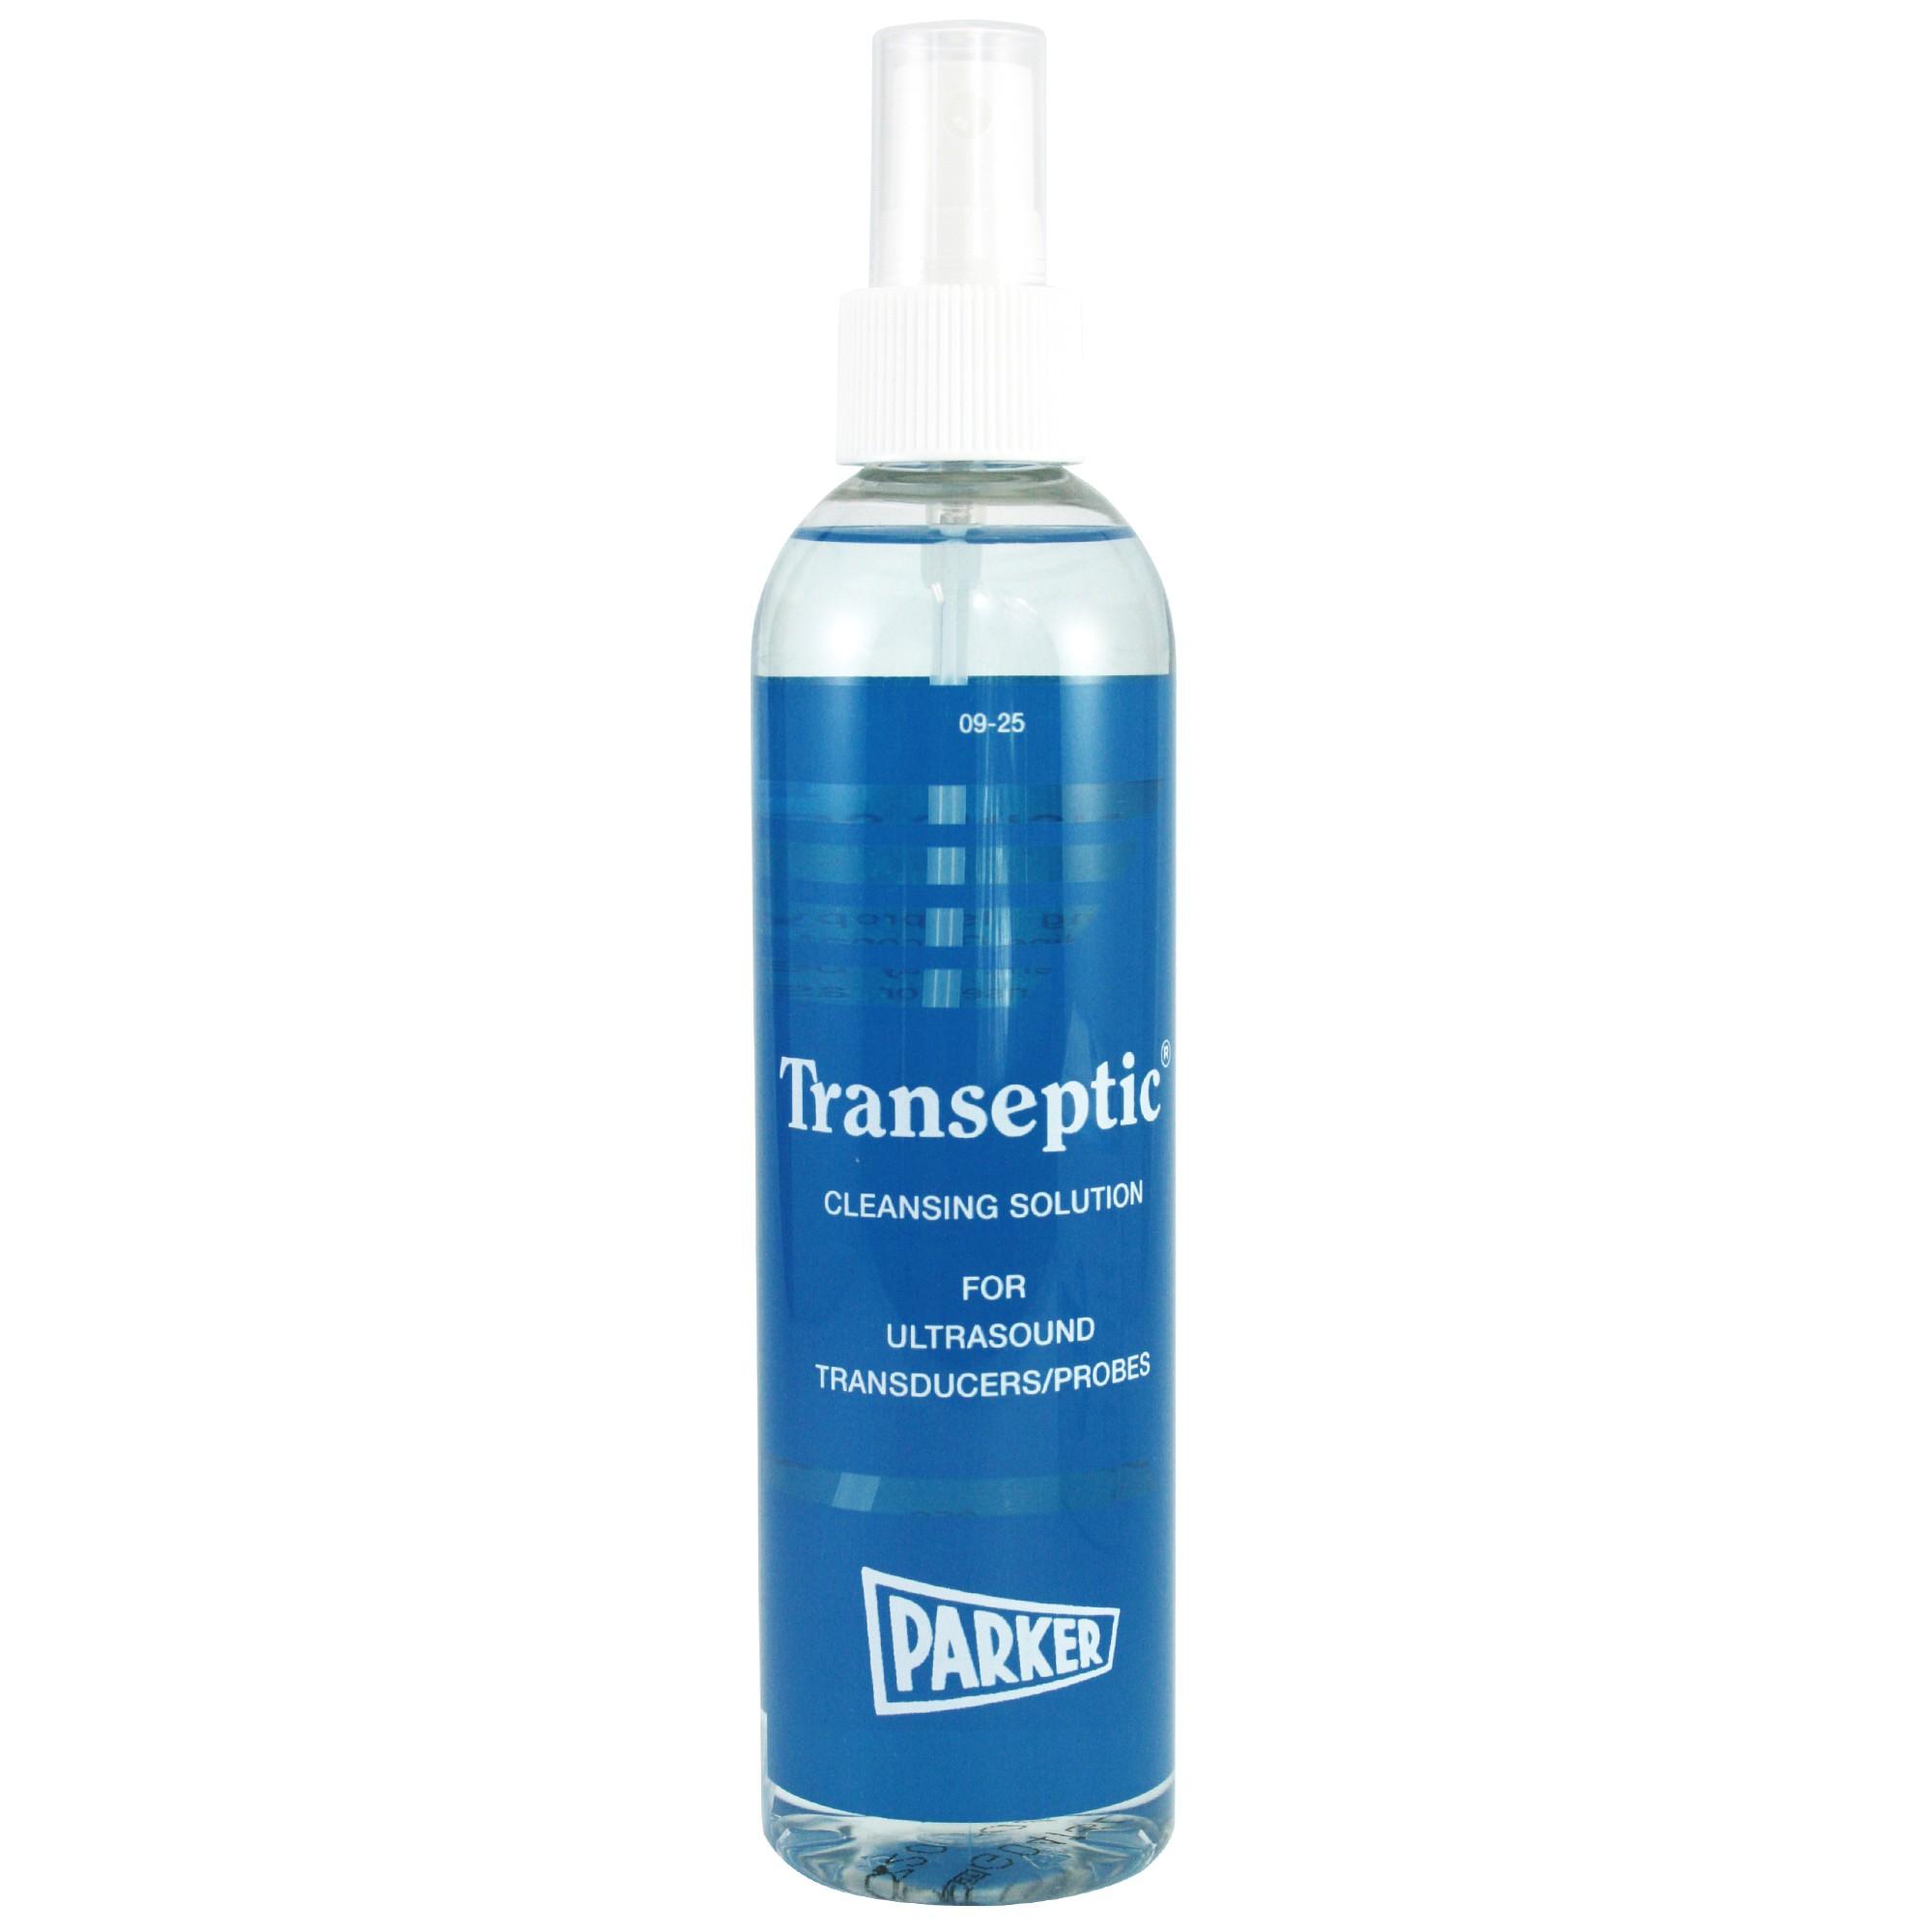 transeptic ultraschallkopf reiniger spray 250 ml diagnostik fachspezifische diagnostik. Black Bedroom Furniture Sets. Home Design Ideas